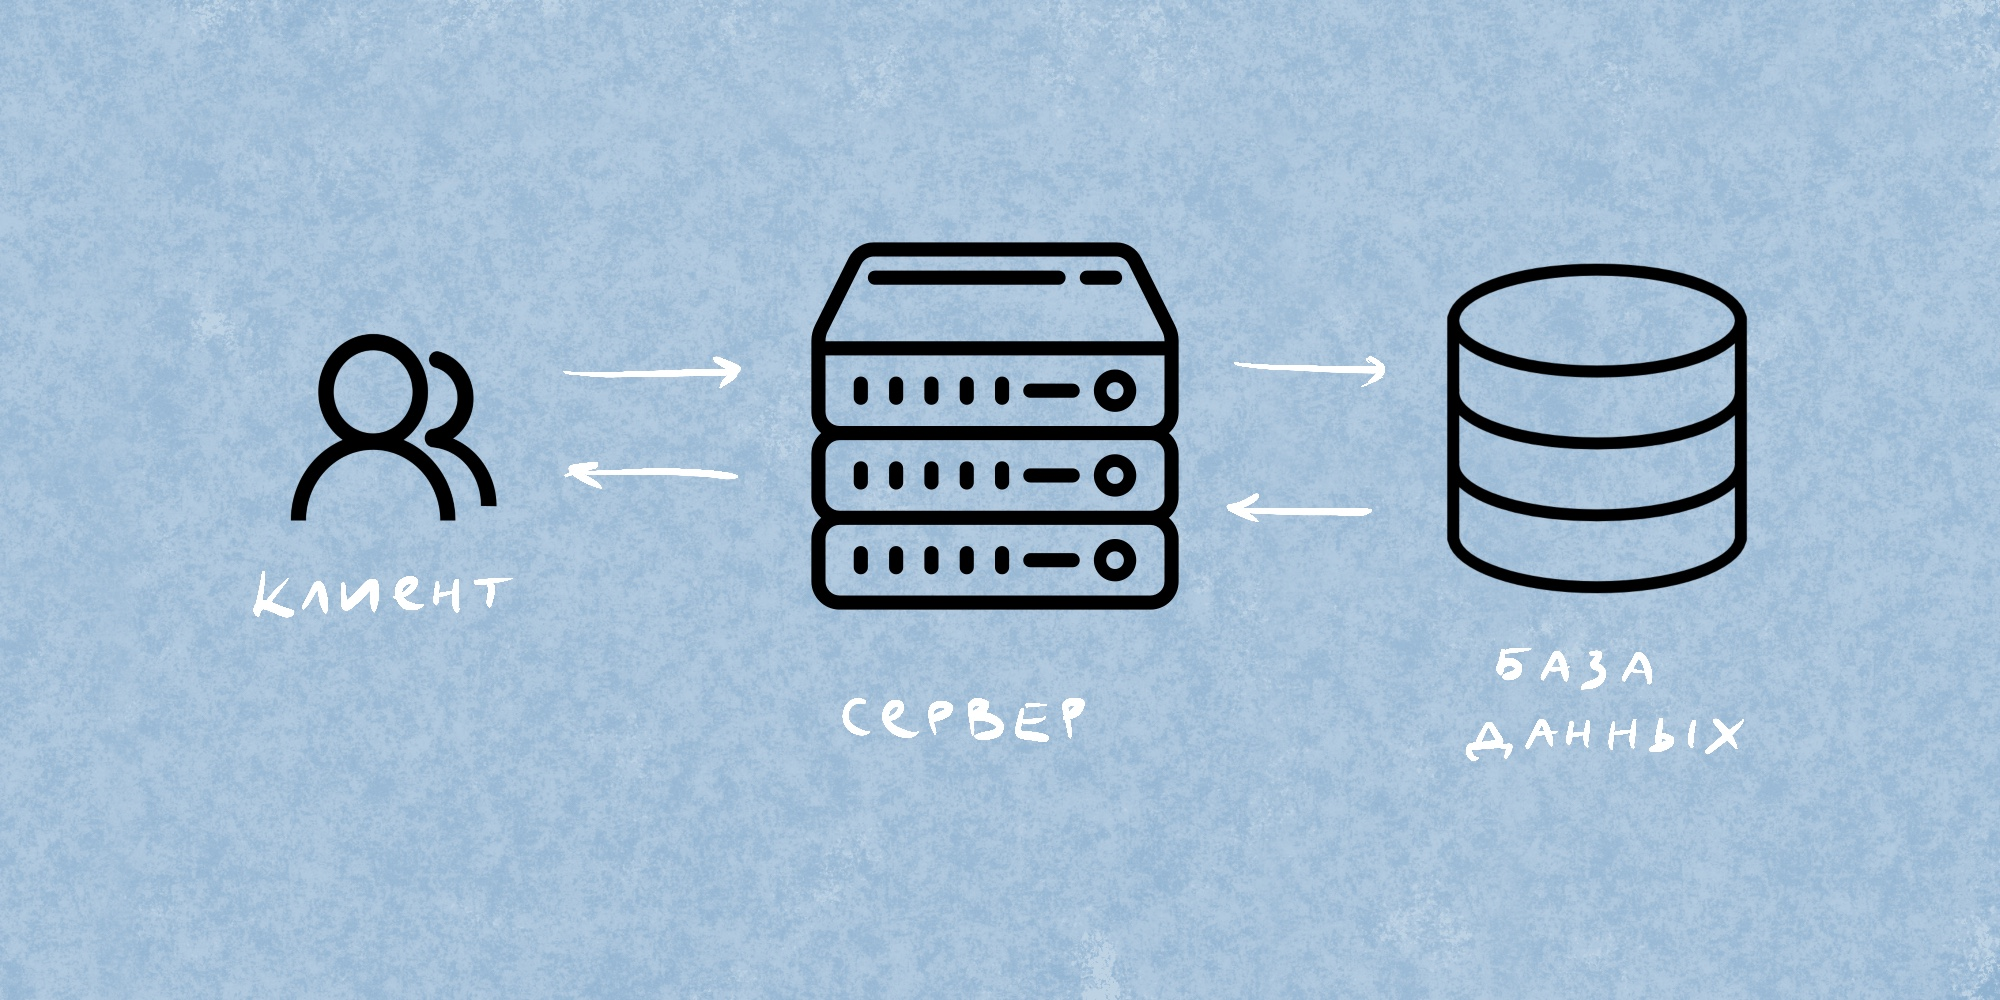 Схема клиент-серверной архитектуры.